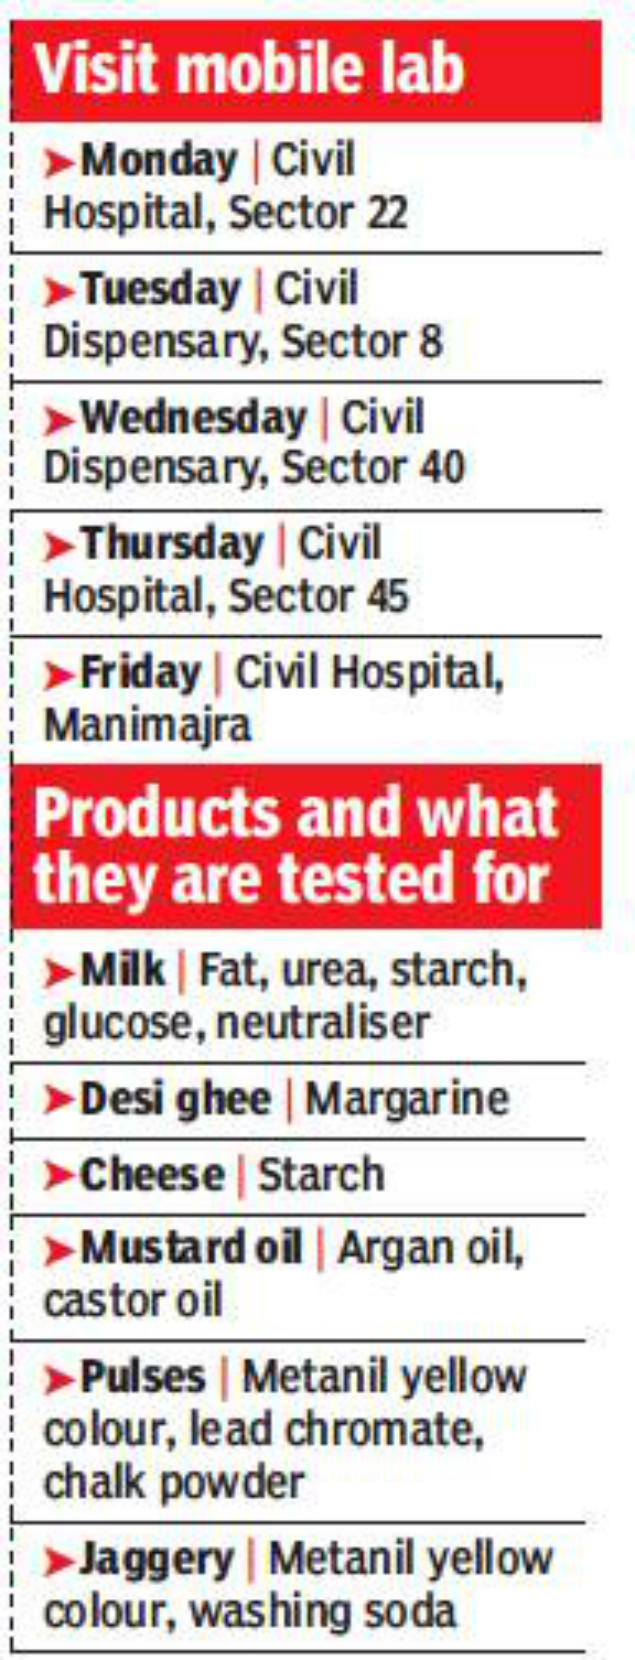 Test Your Food Sample: Test Your Food Sample | Chandigarh